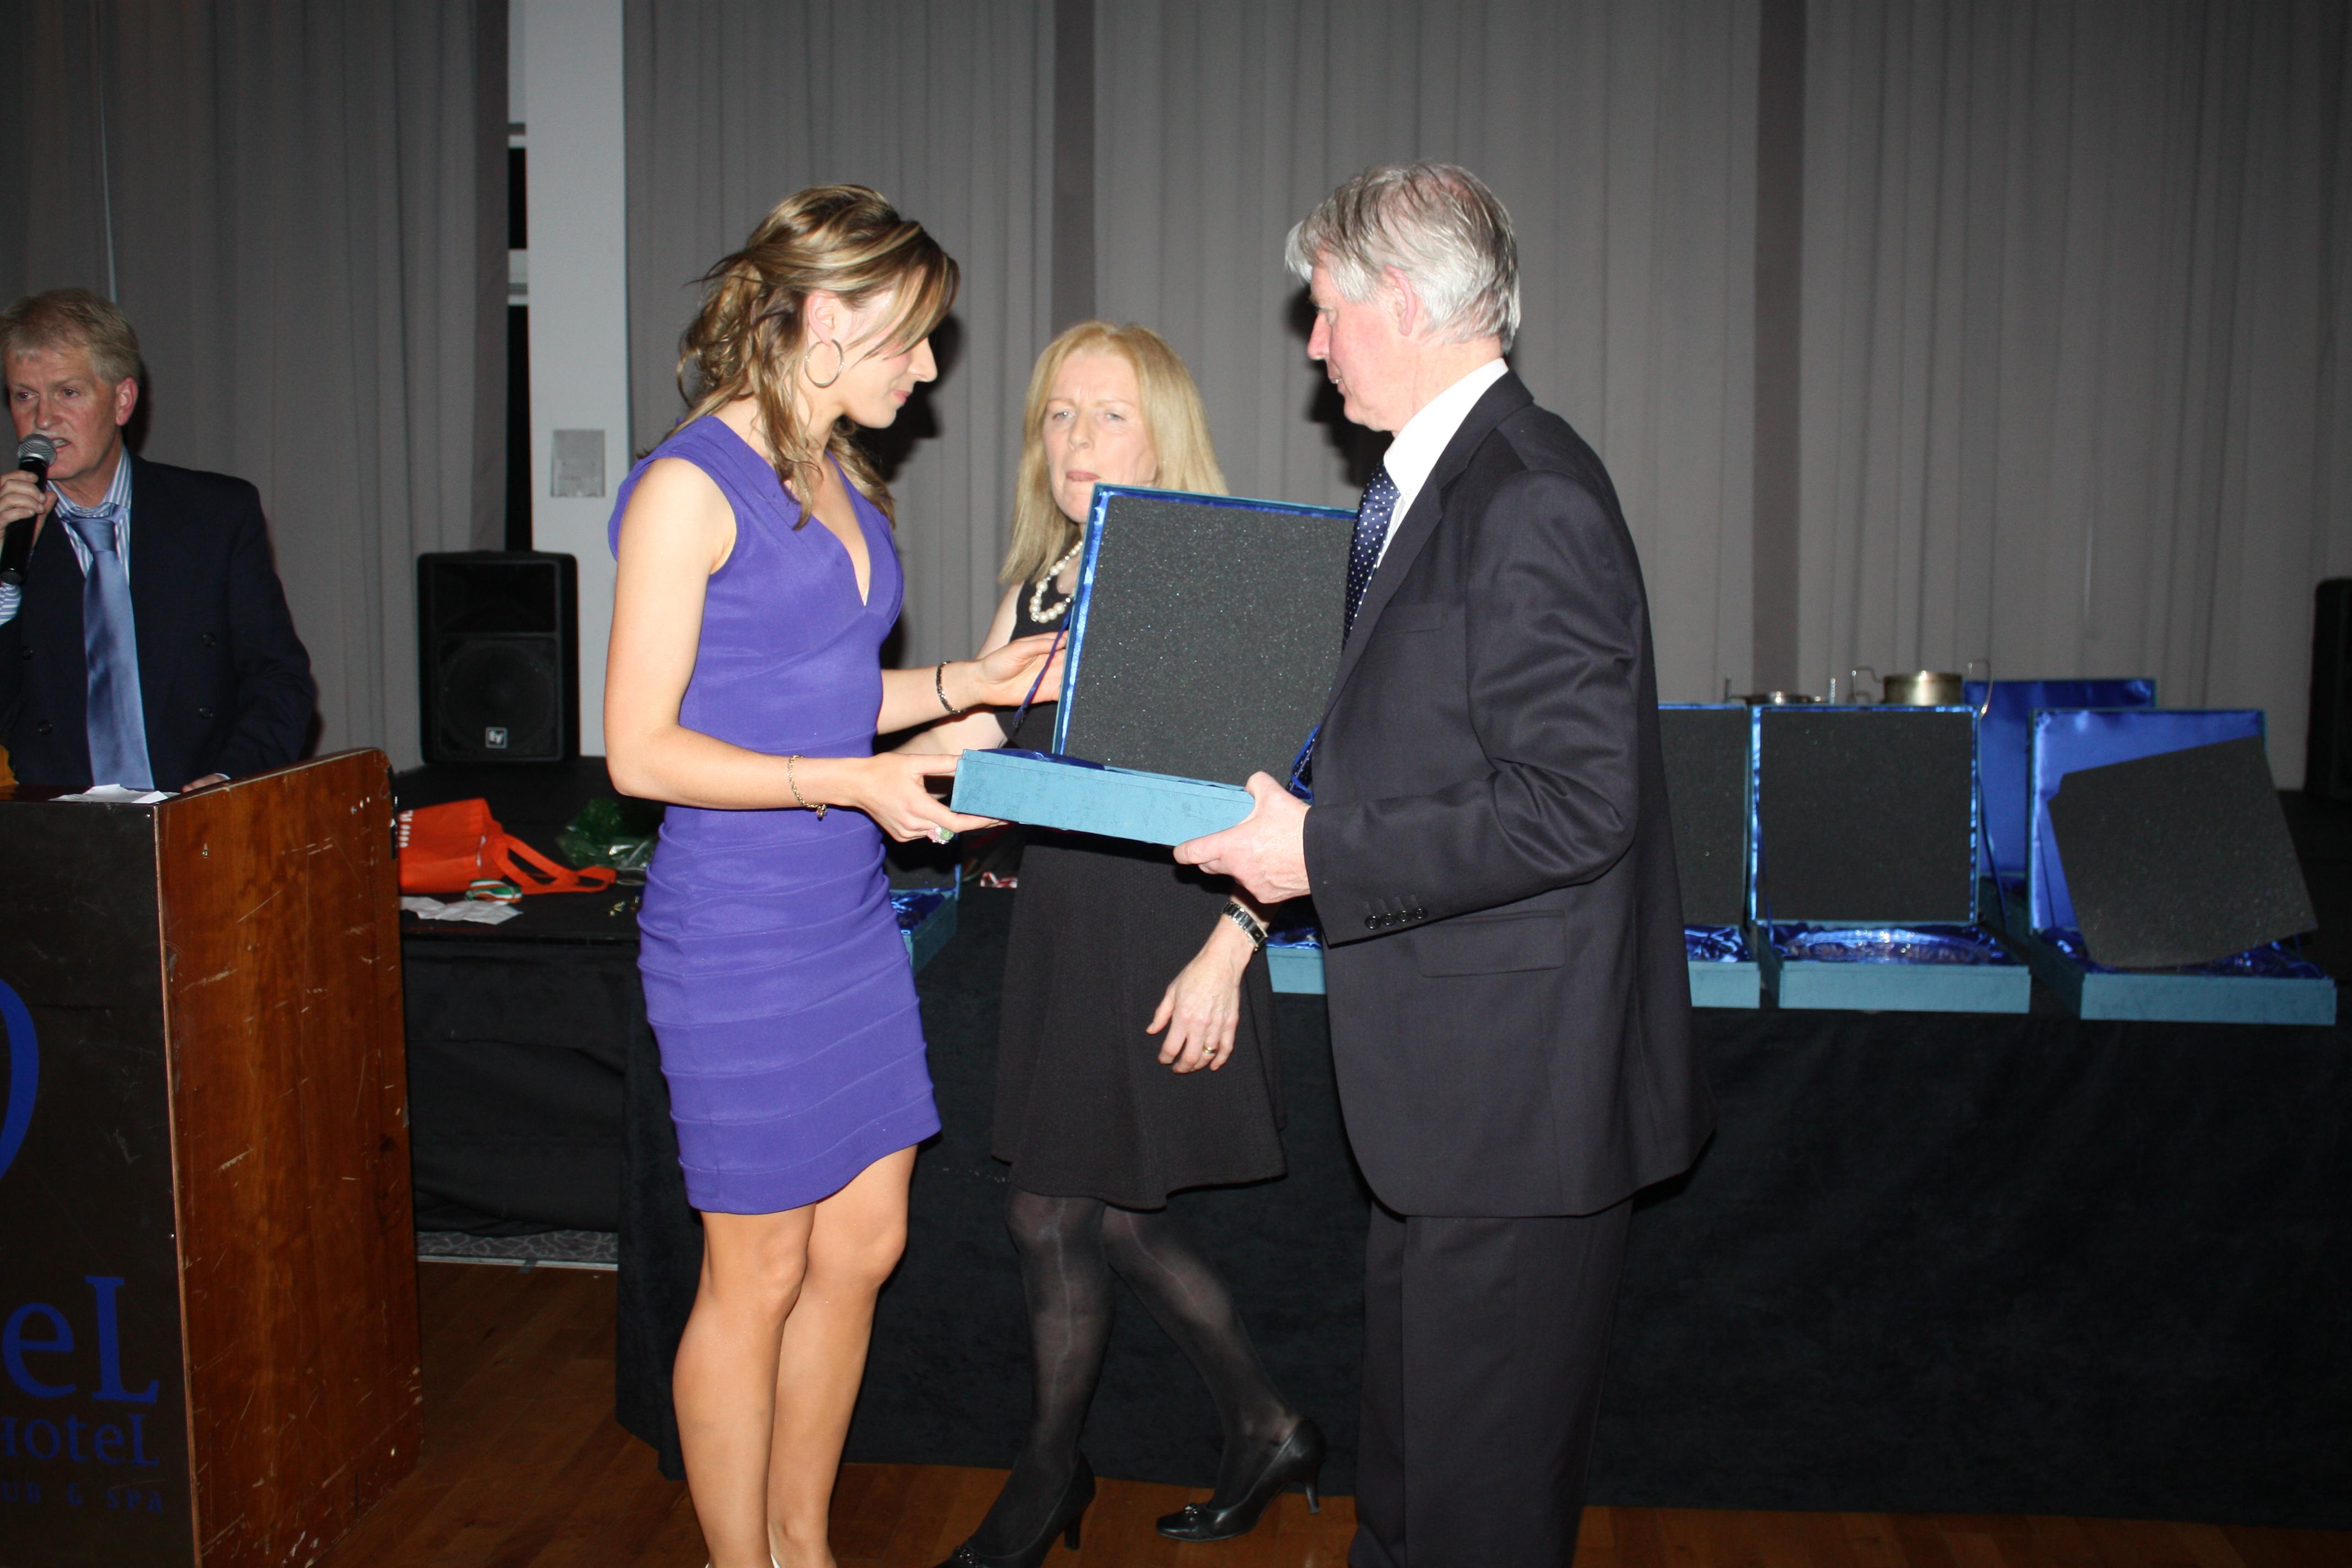 st-finbarrs-awards-night-2012-020